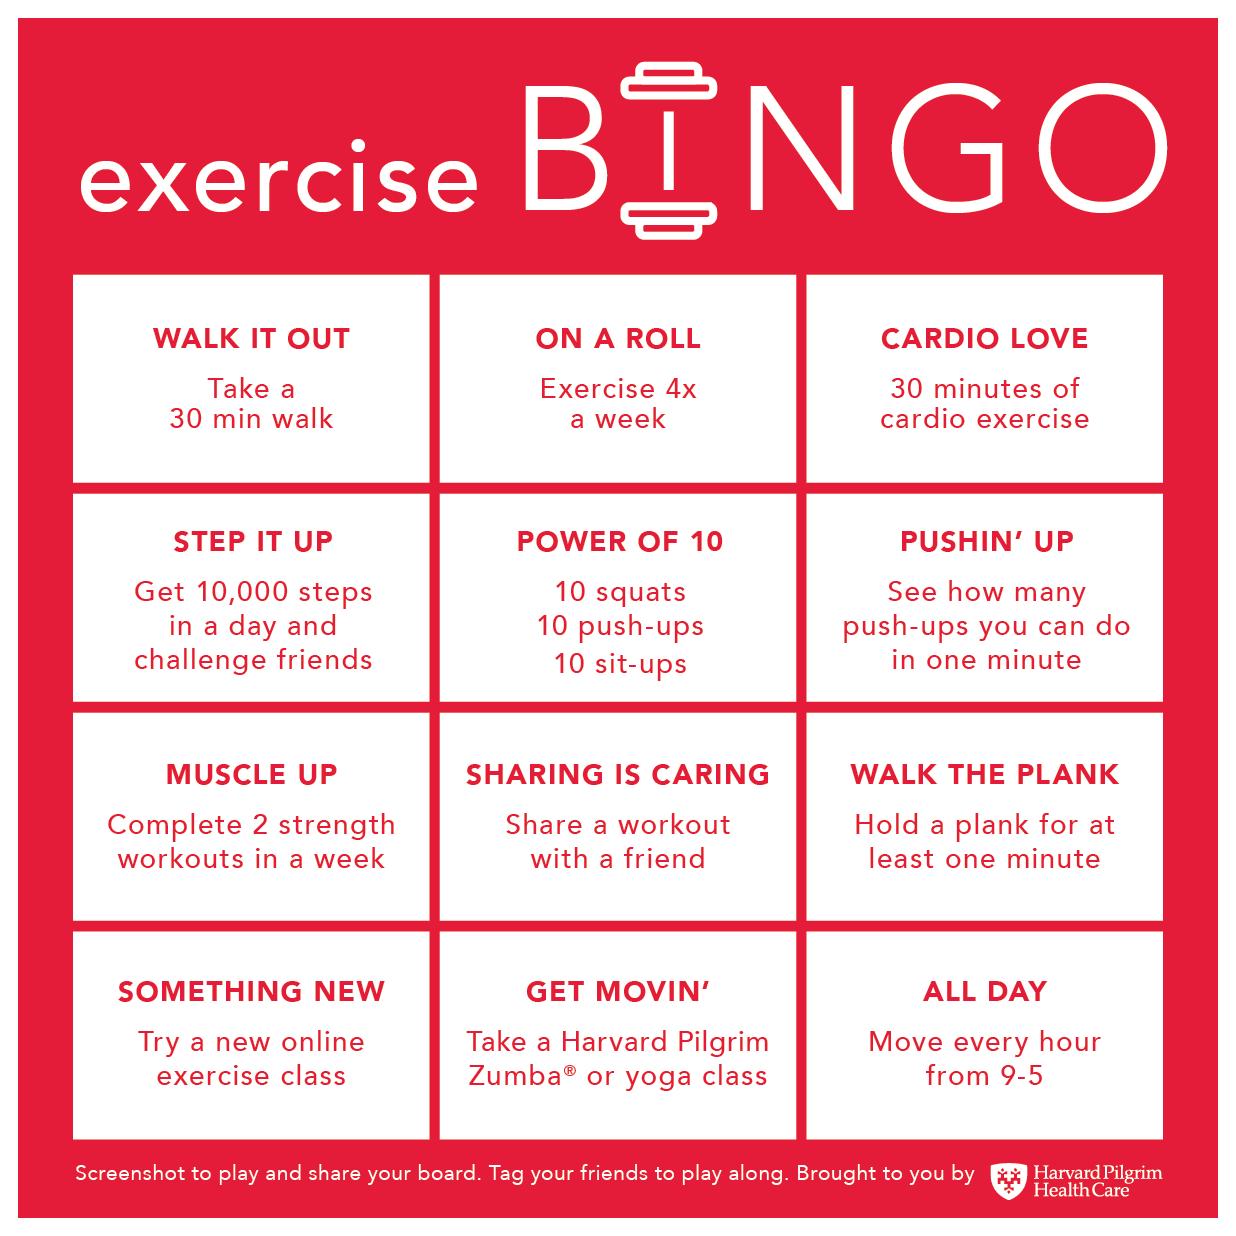 Exercise Bingo